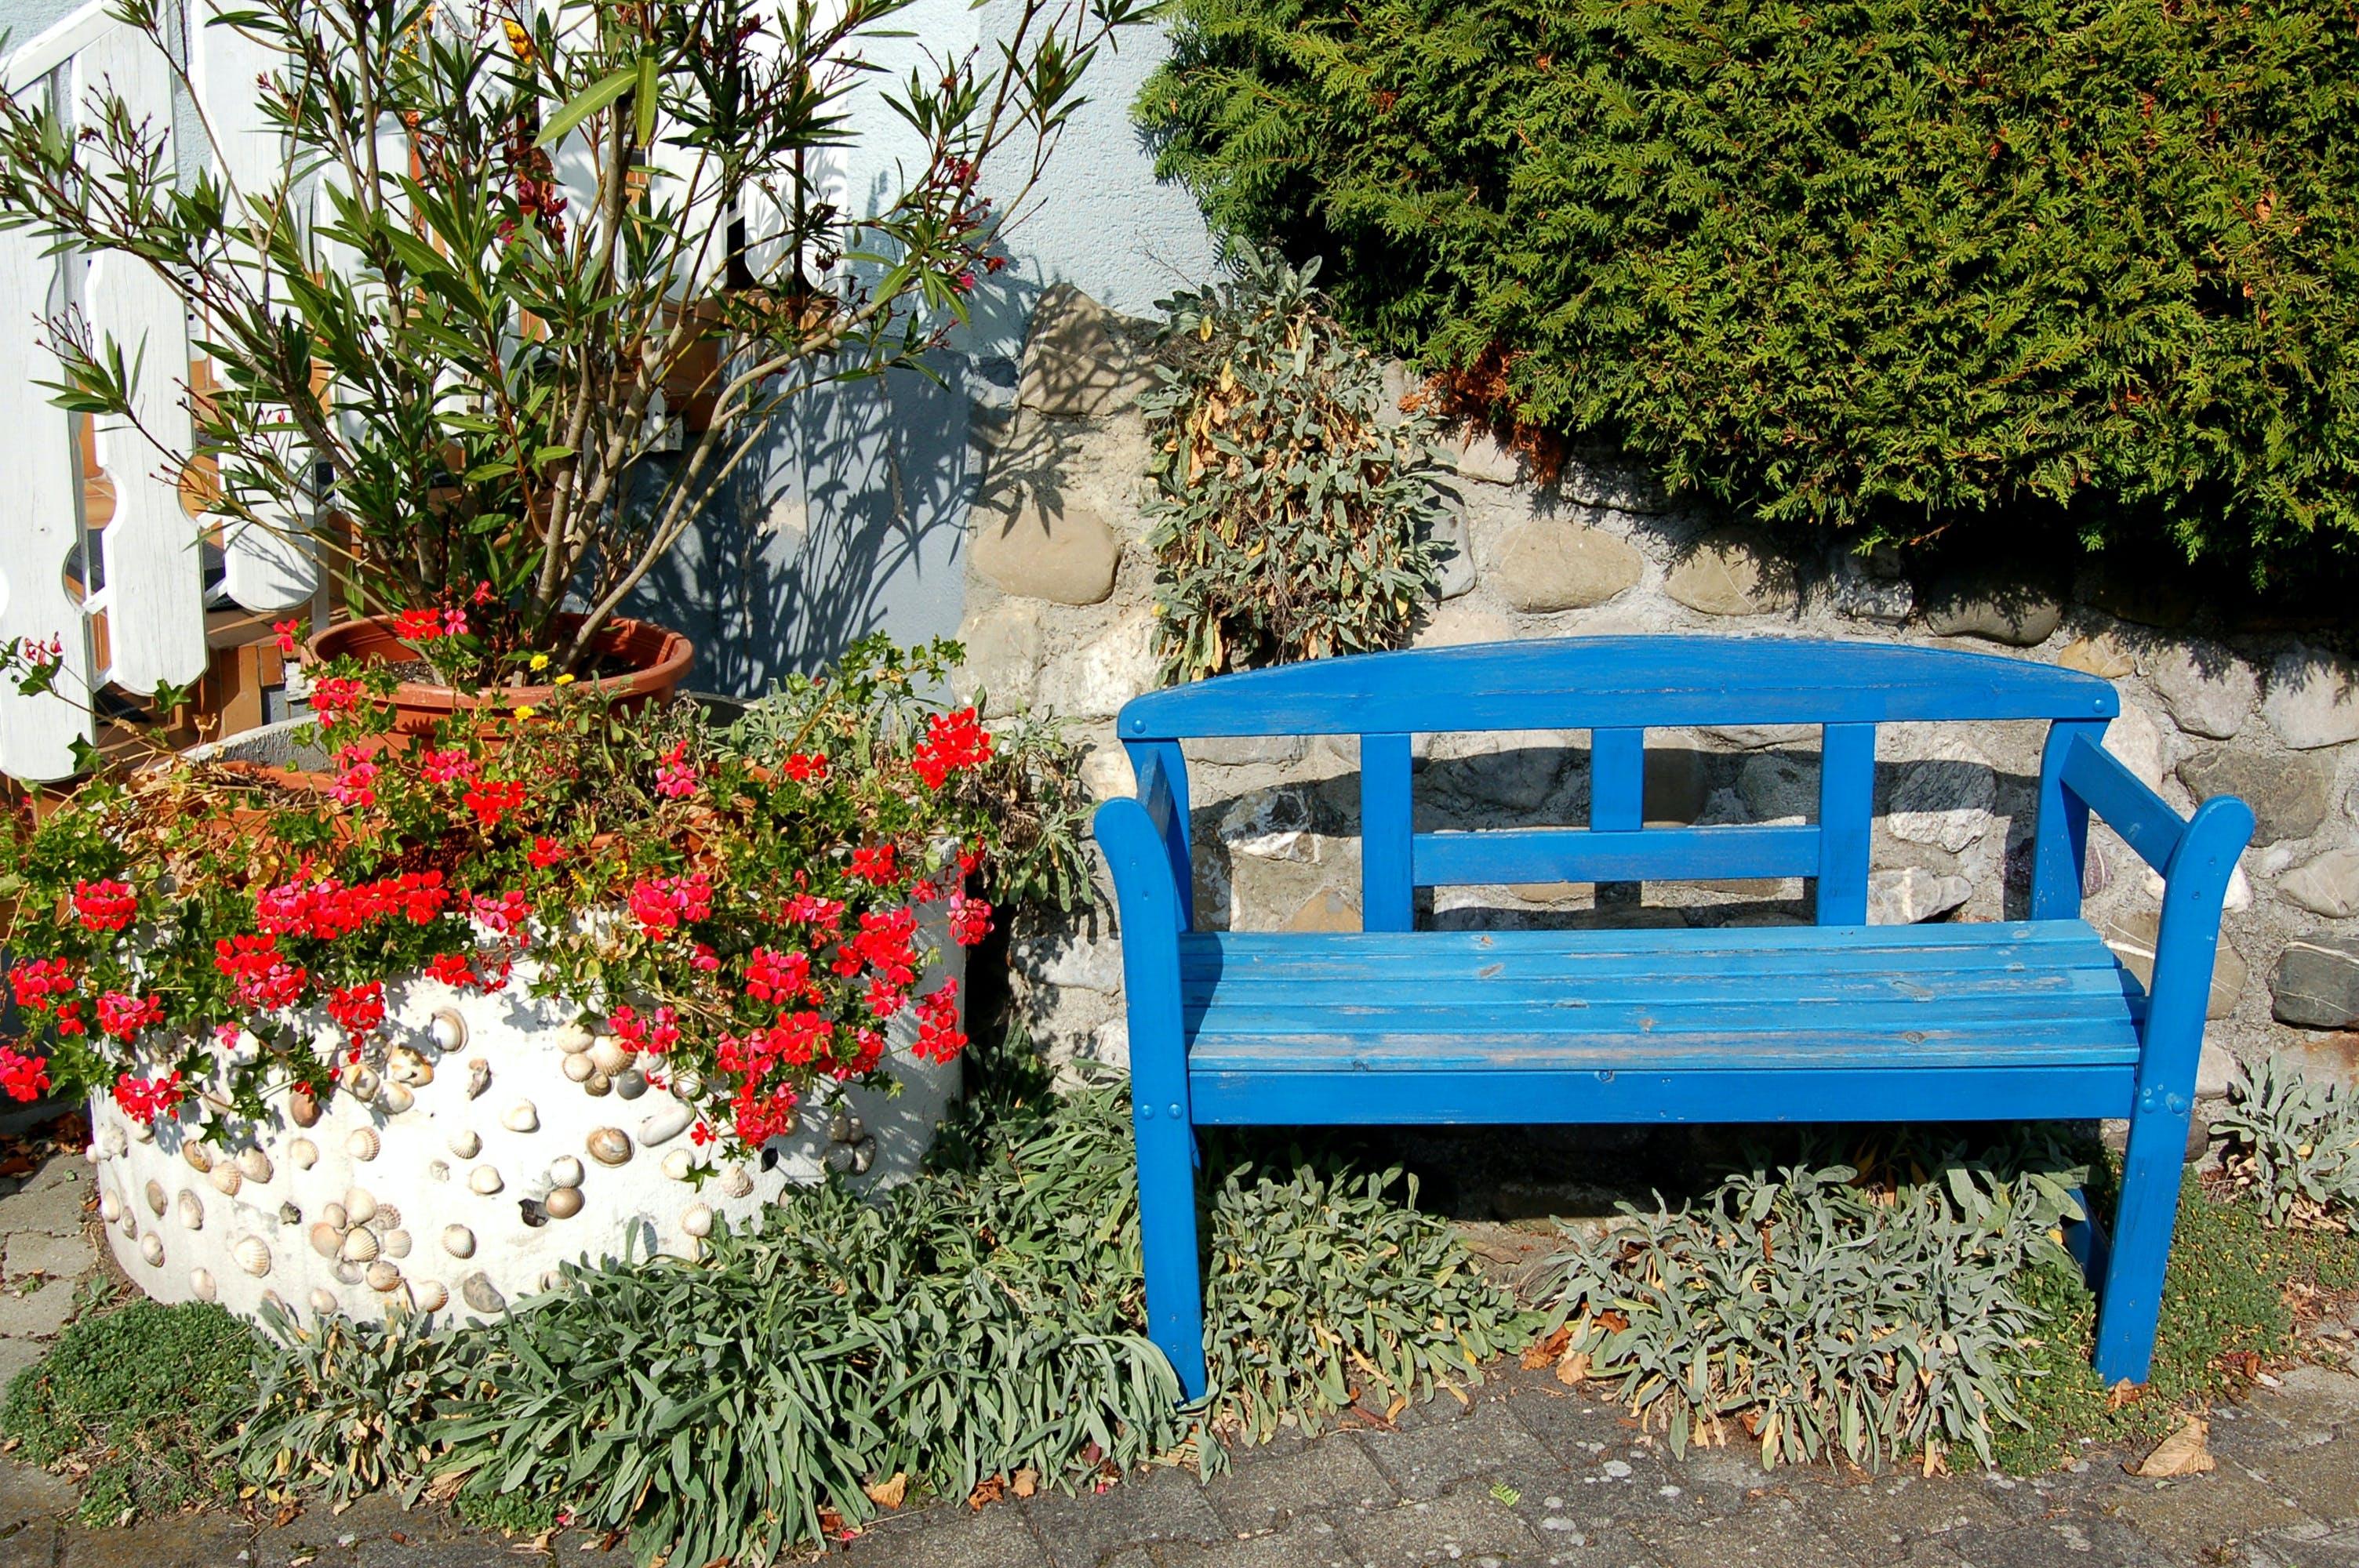 bench, blue color, flowering plant